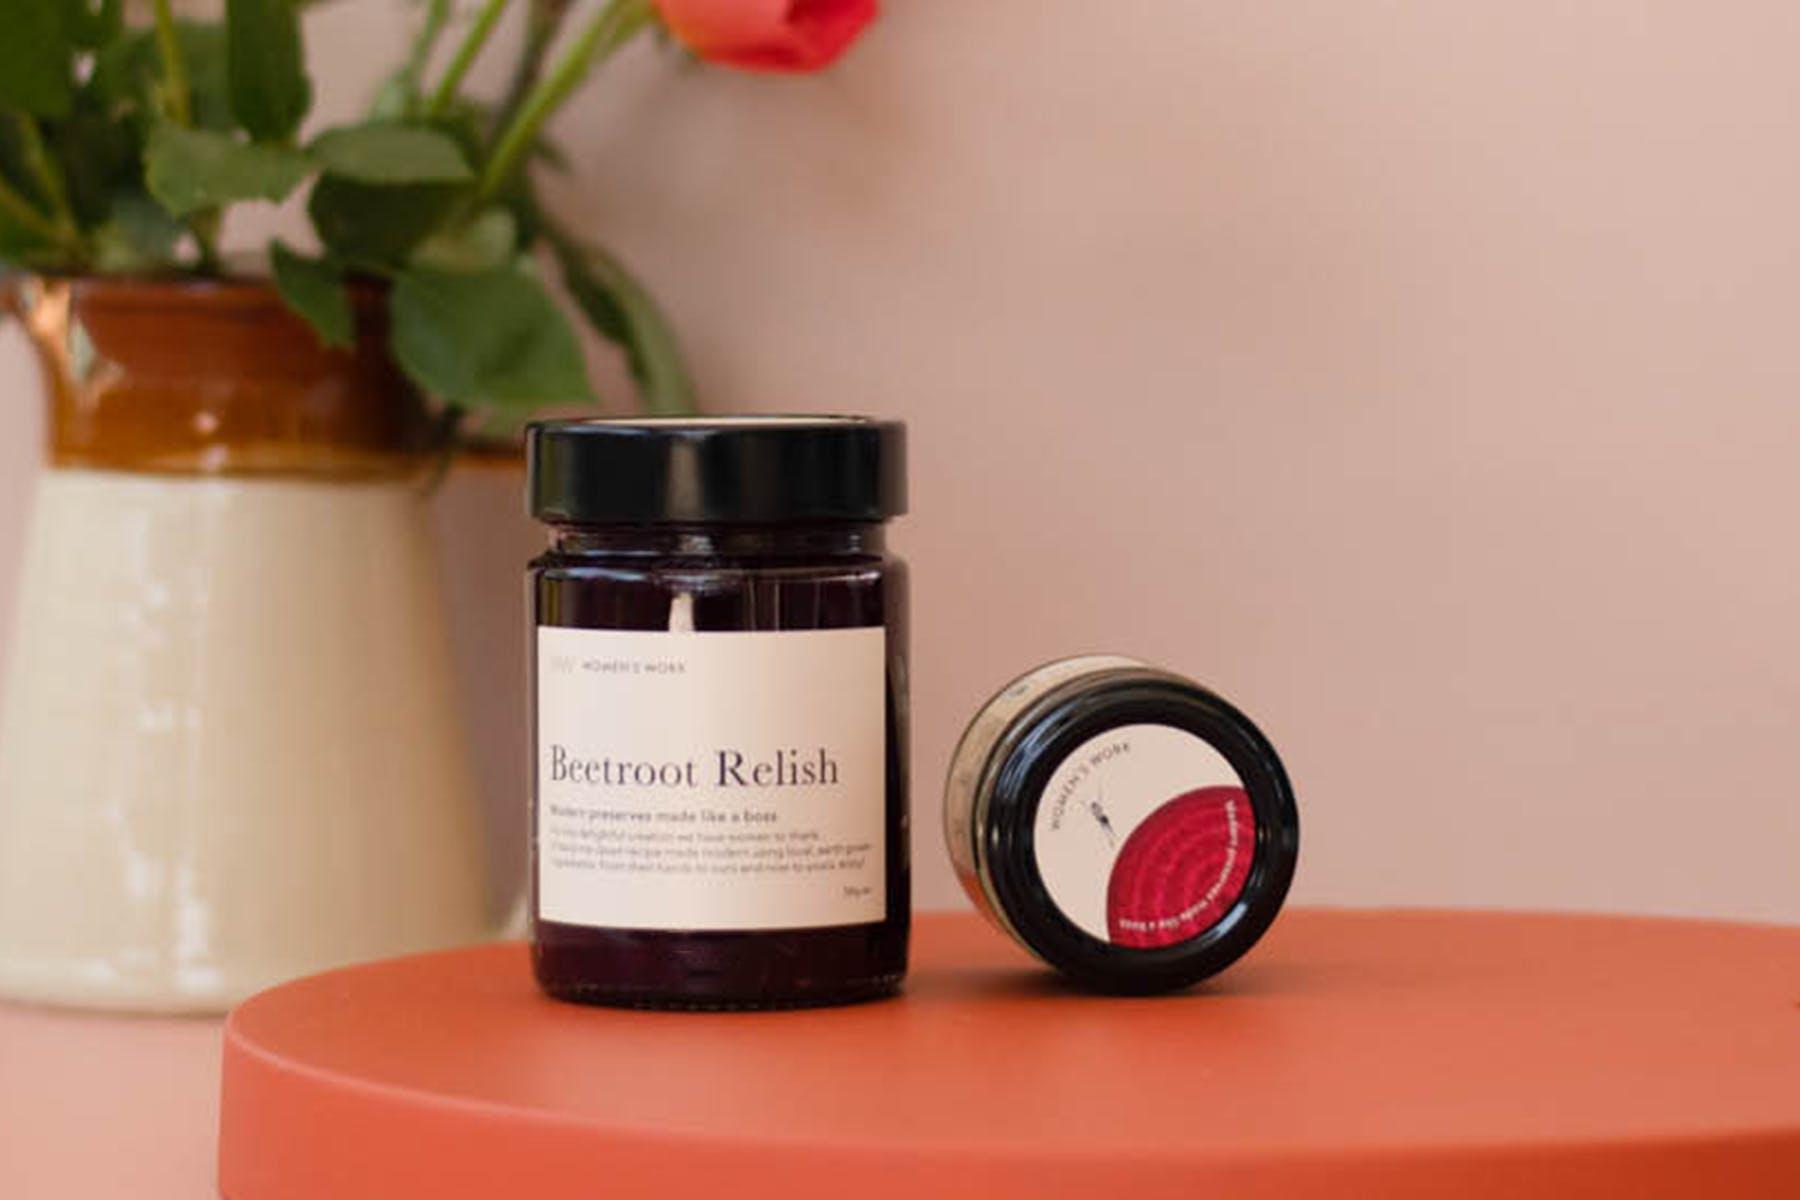 A jar of Women's Work beetroot relish